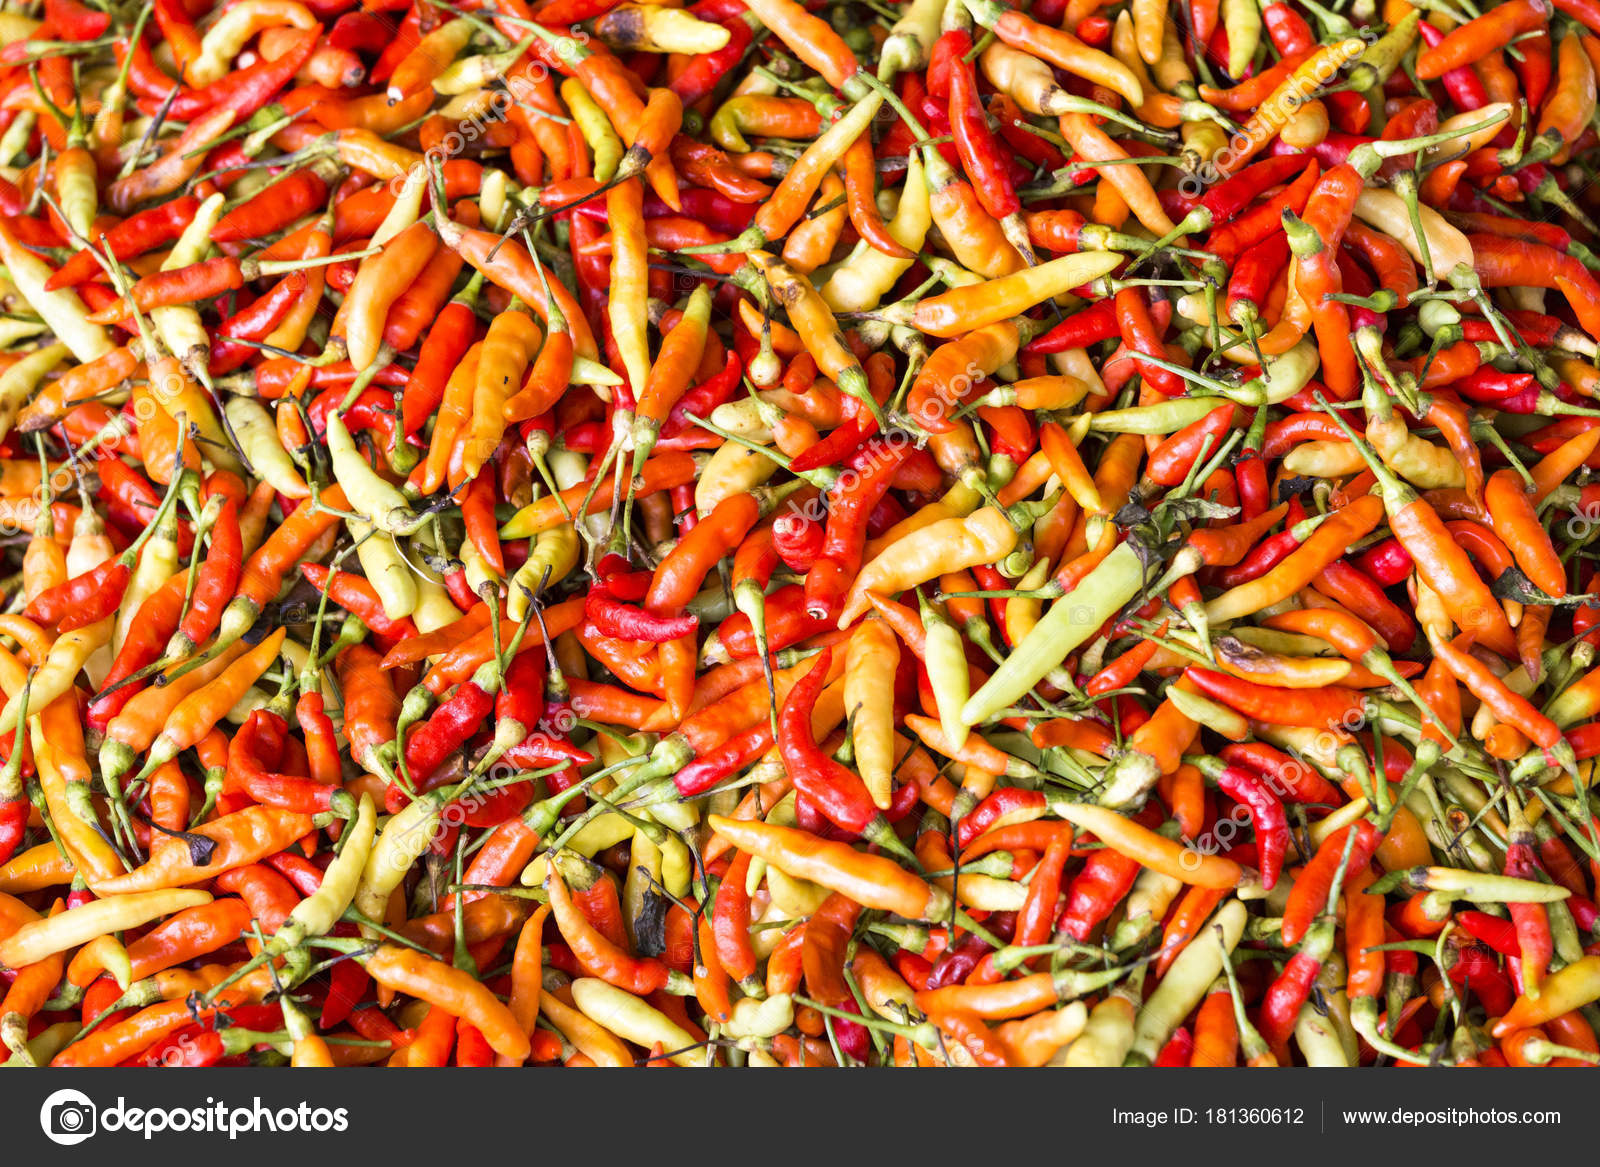 Red Chili Pepper Wallpaper Stock Photo C Mauriziobiso 1 181360612